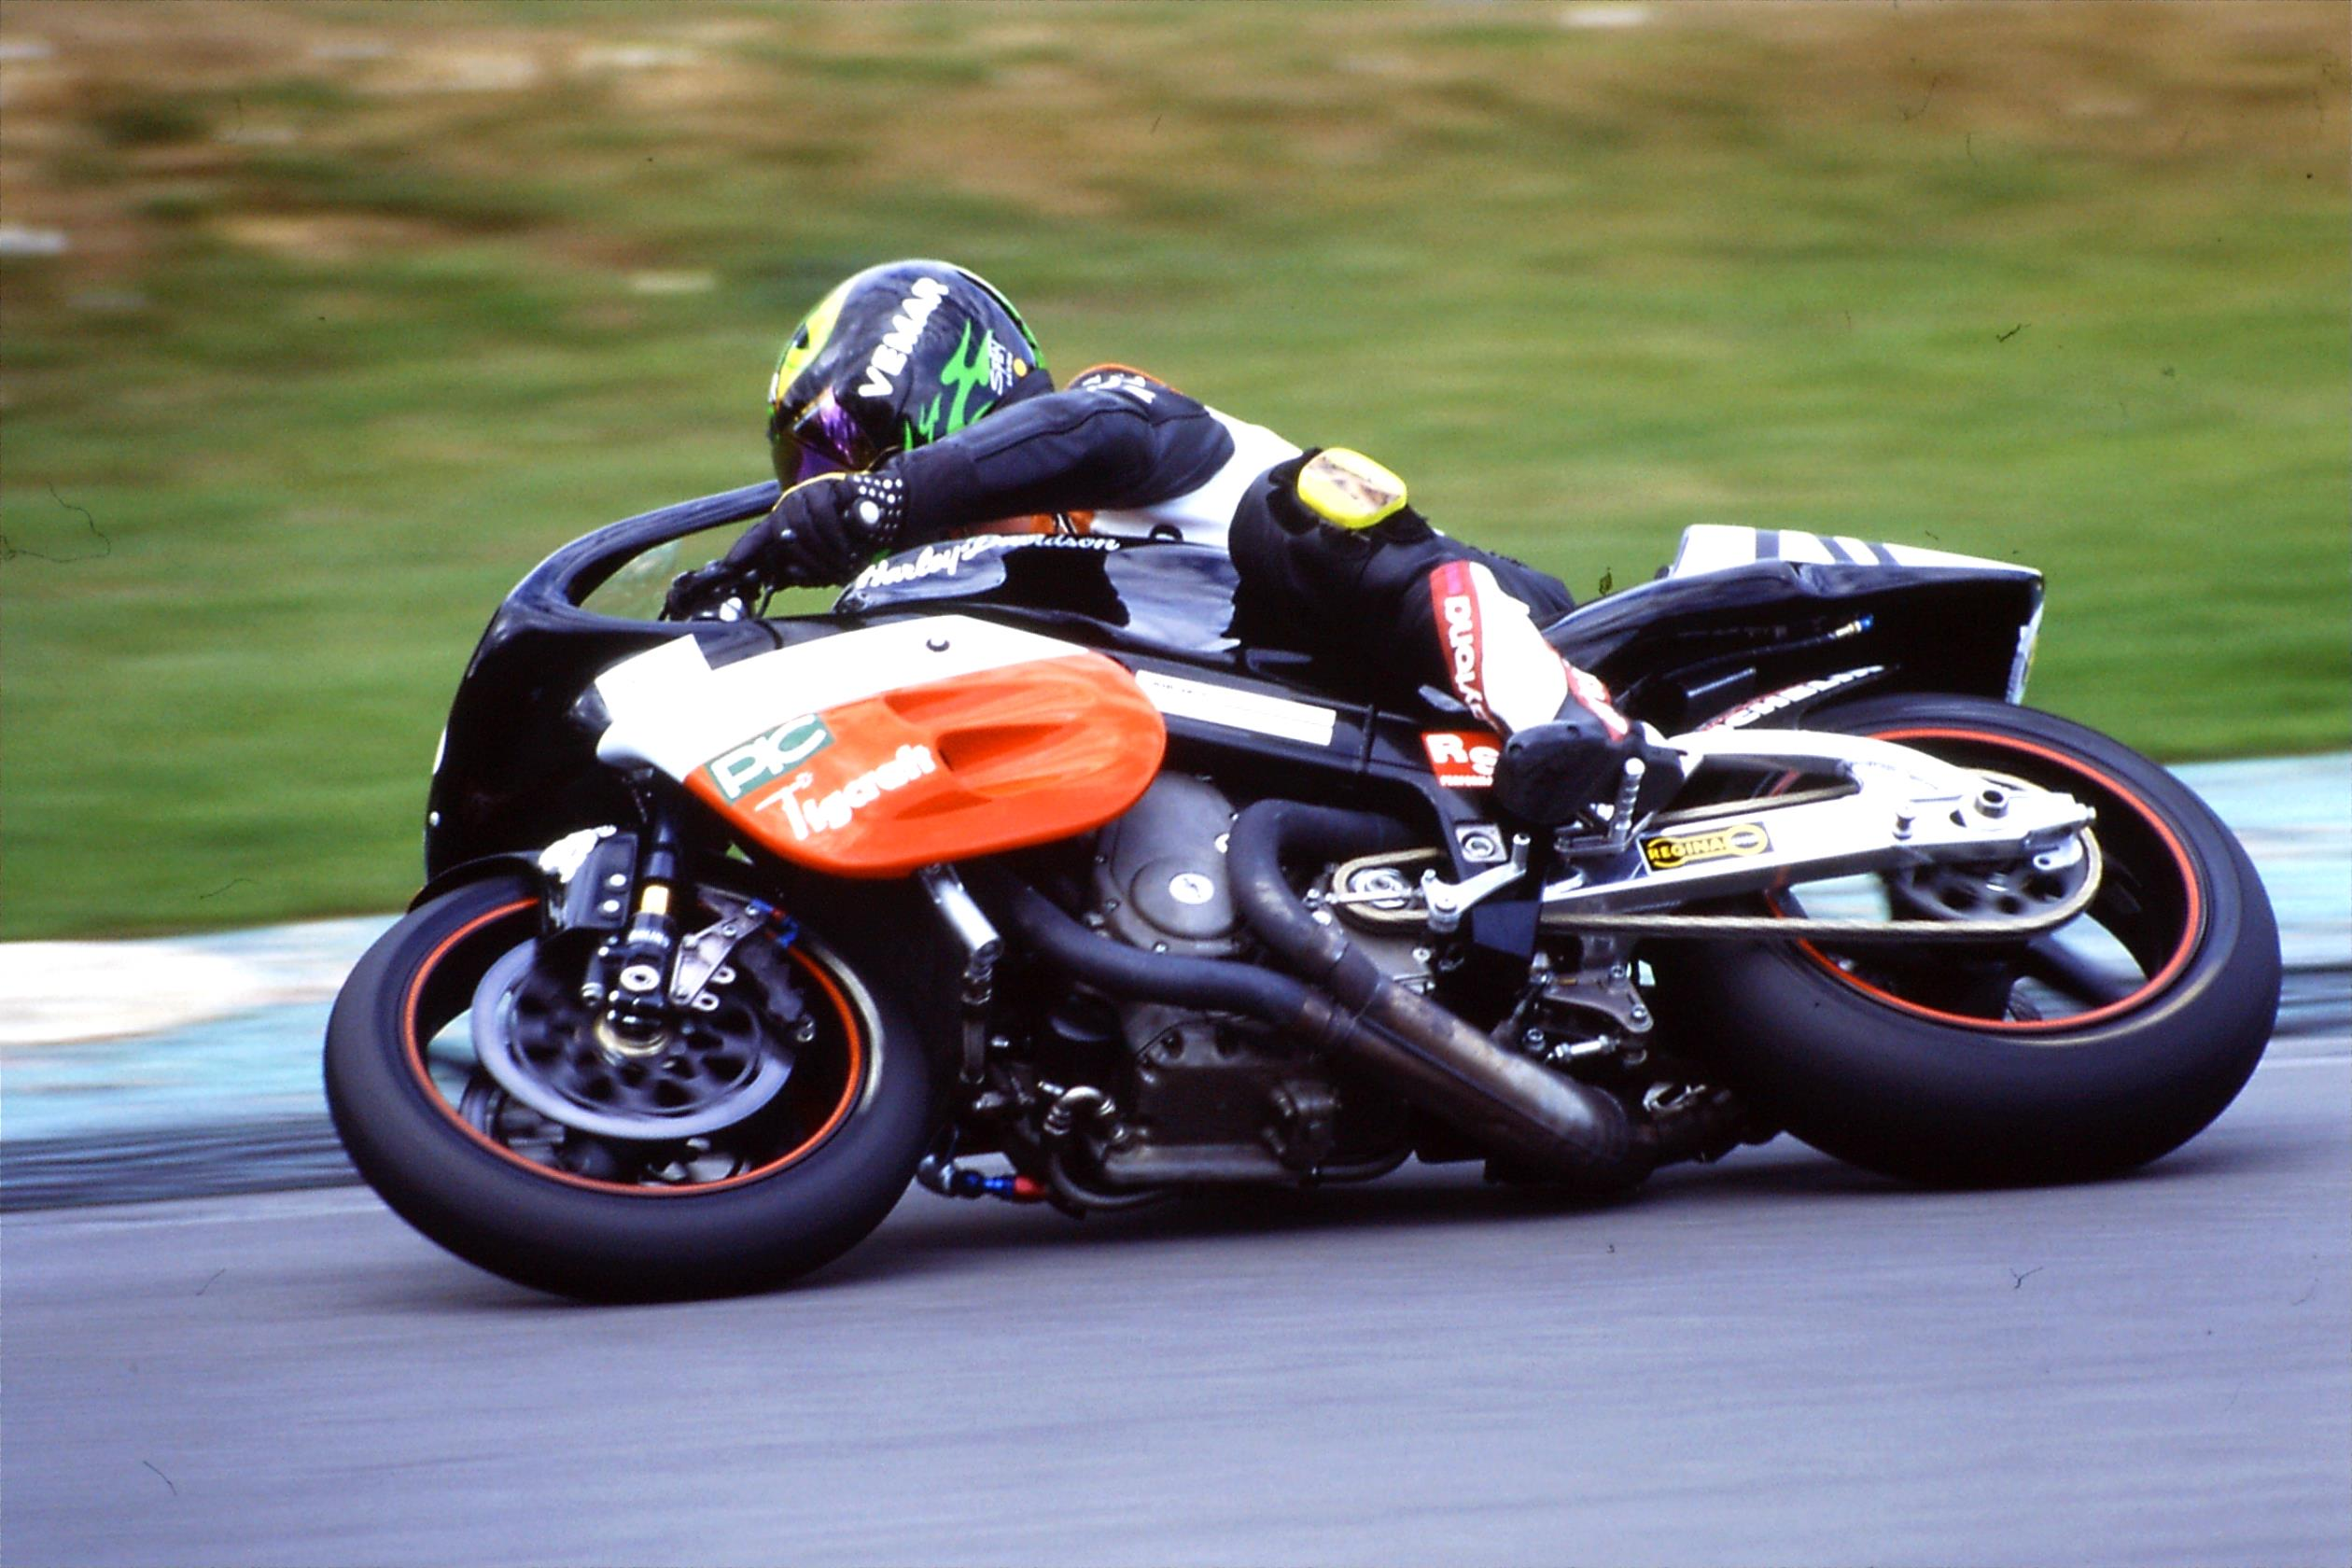 Harley Davidson VR1000